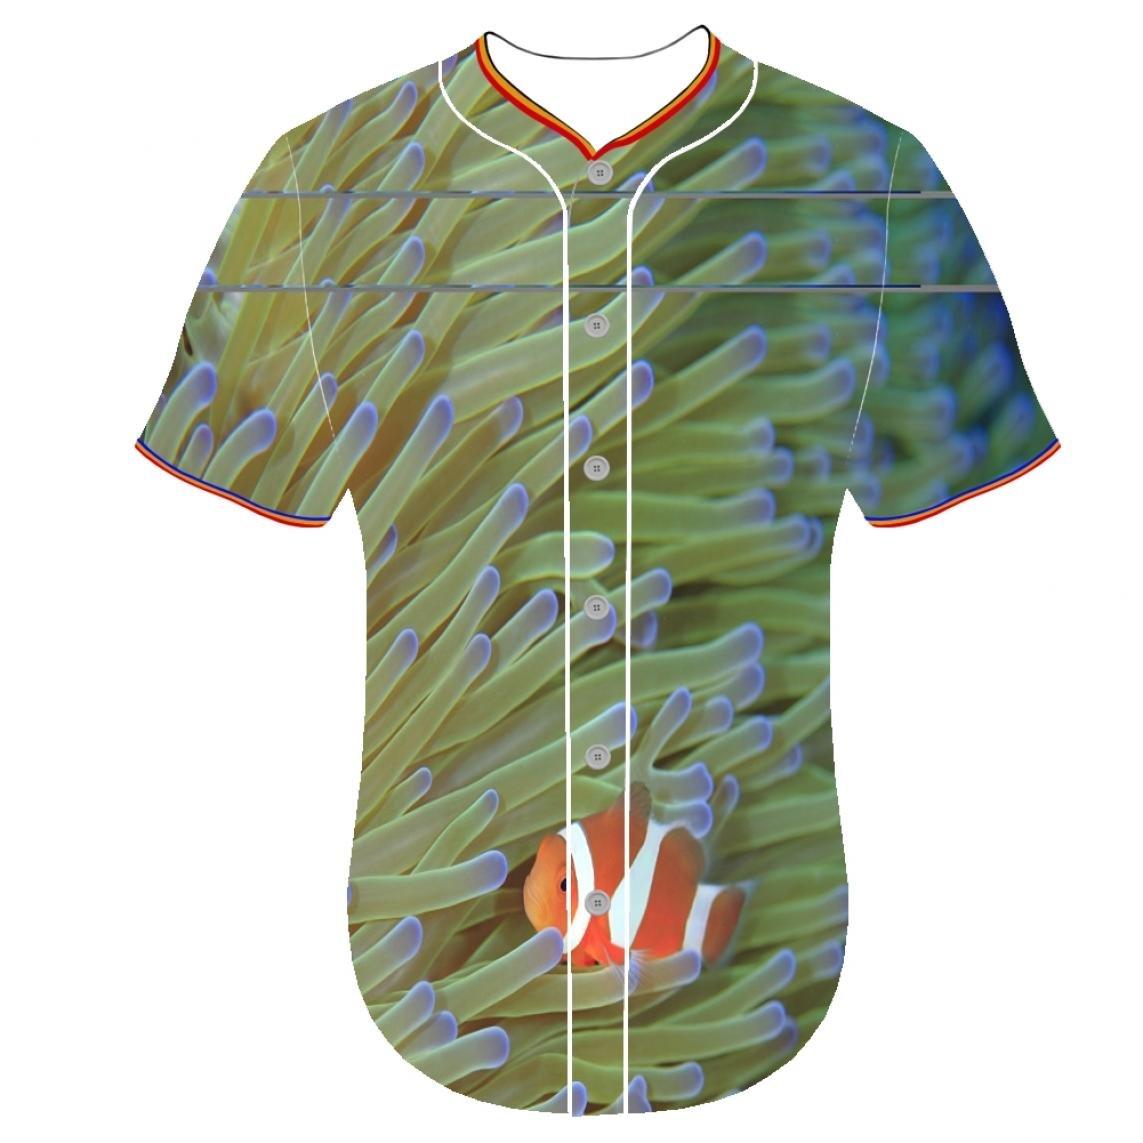 Baseball jersey 3dプリンタustomizationメンズジャージTropical Fish Ewzn 3dプリントタキシードTシャツボタンフロントシャツpcangquji円弧下部 B079DQQWMBXX-Large